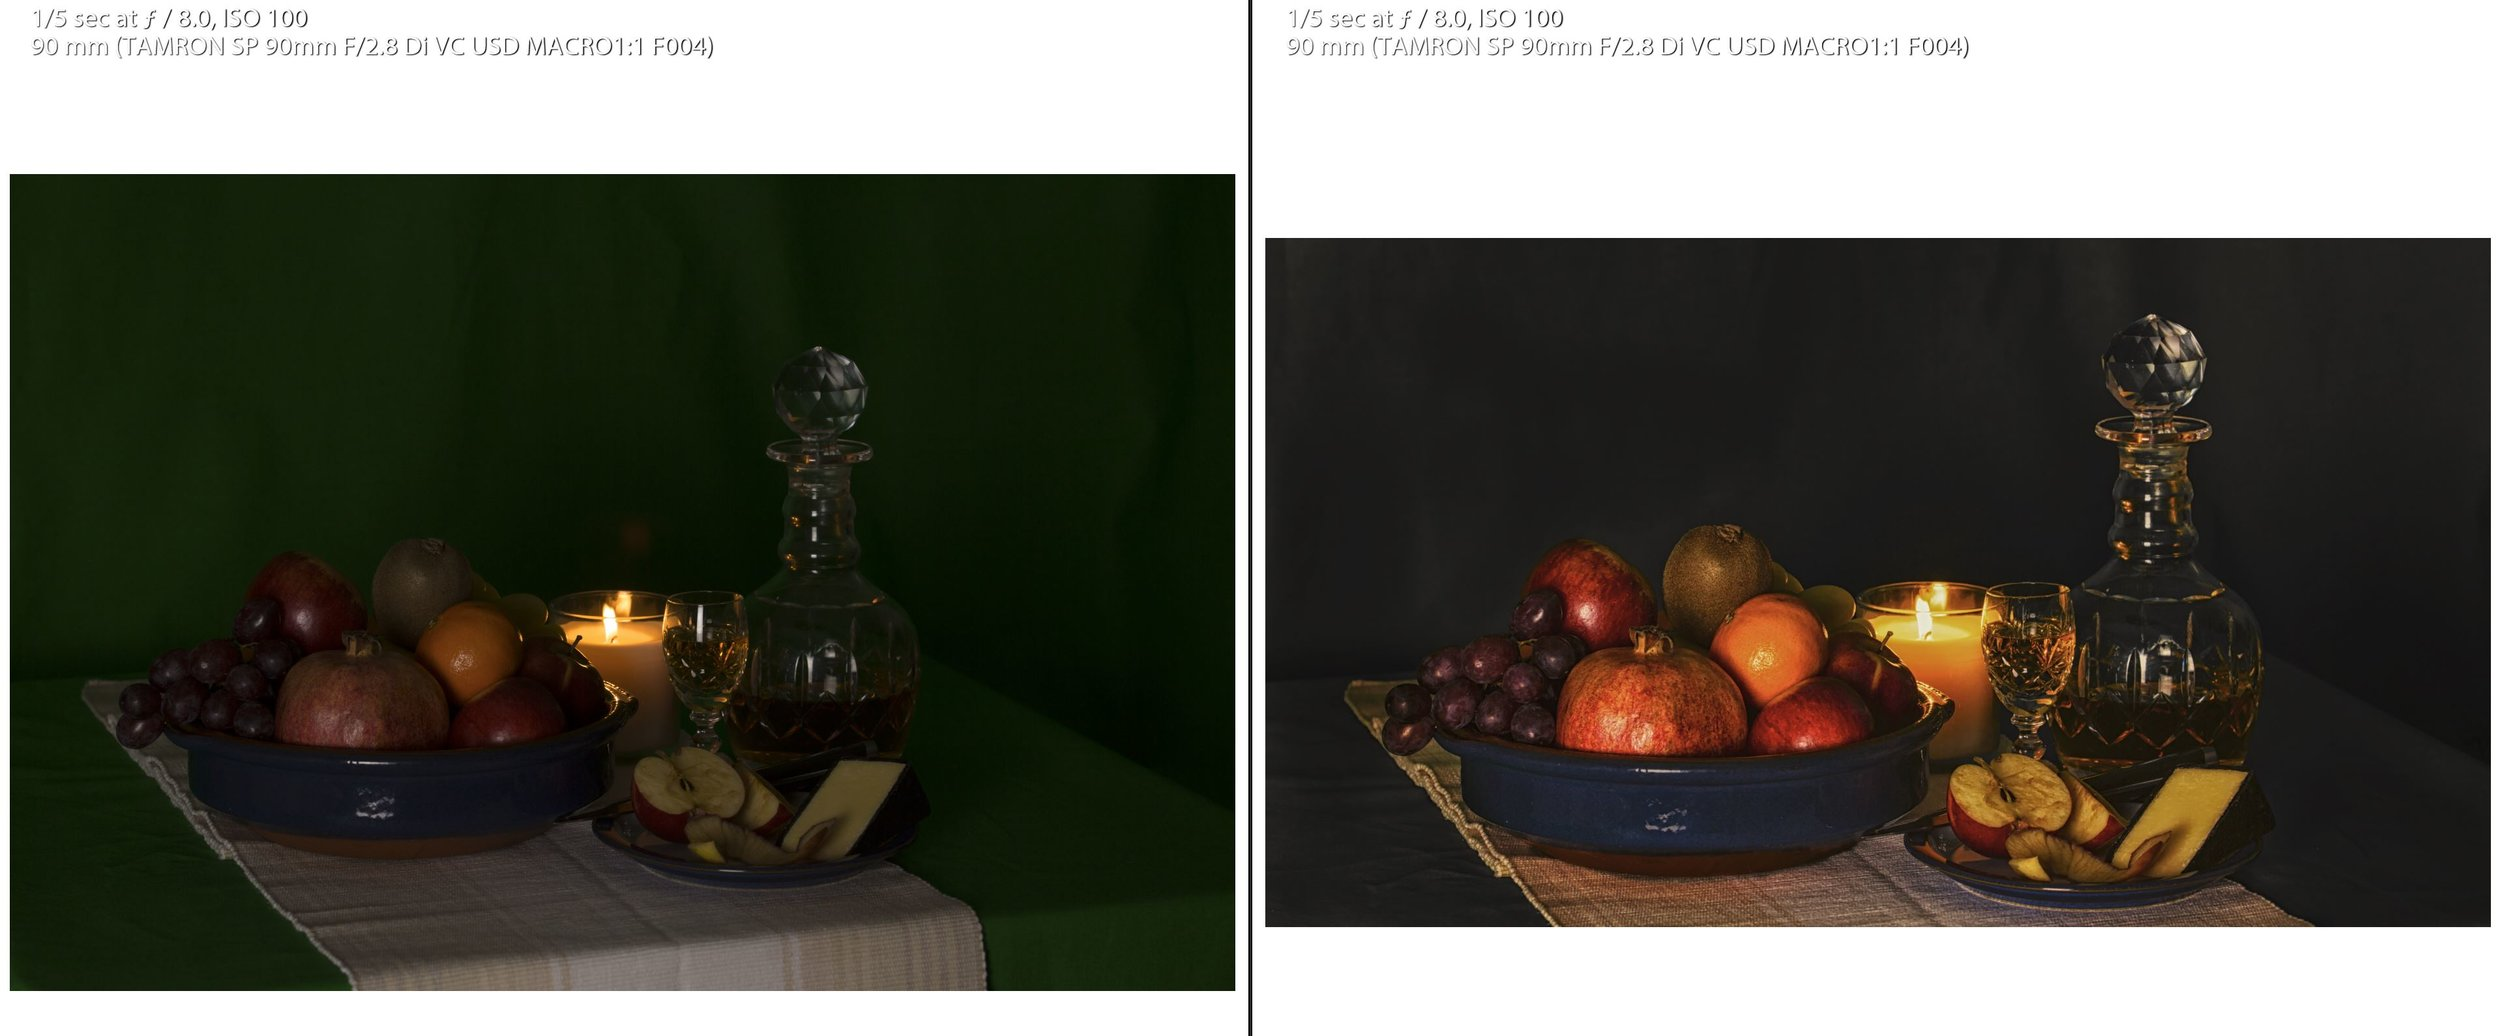 Janet2-alan-ranger-photography-creative-editing-masterclass.JPG